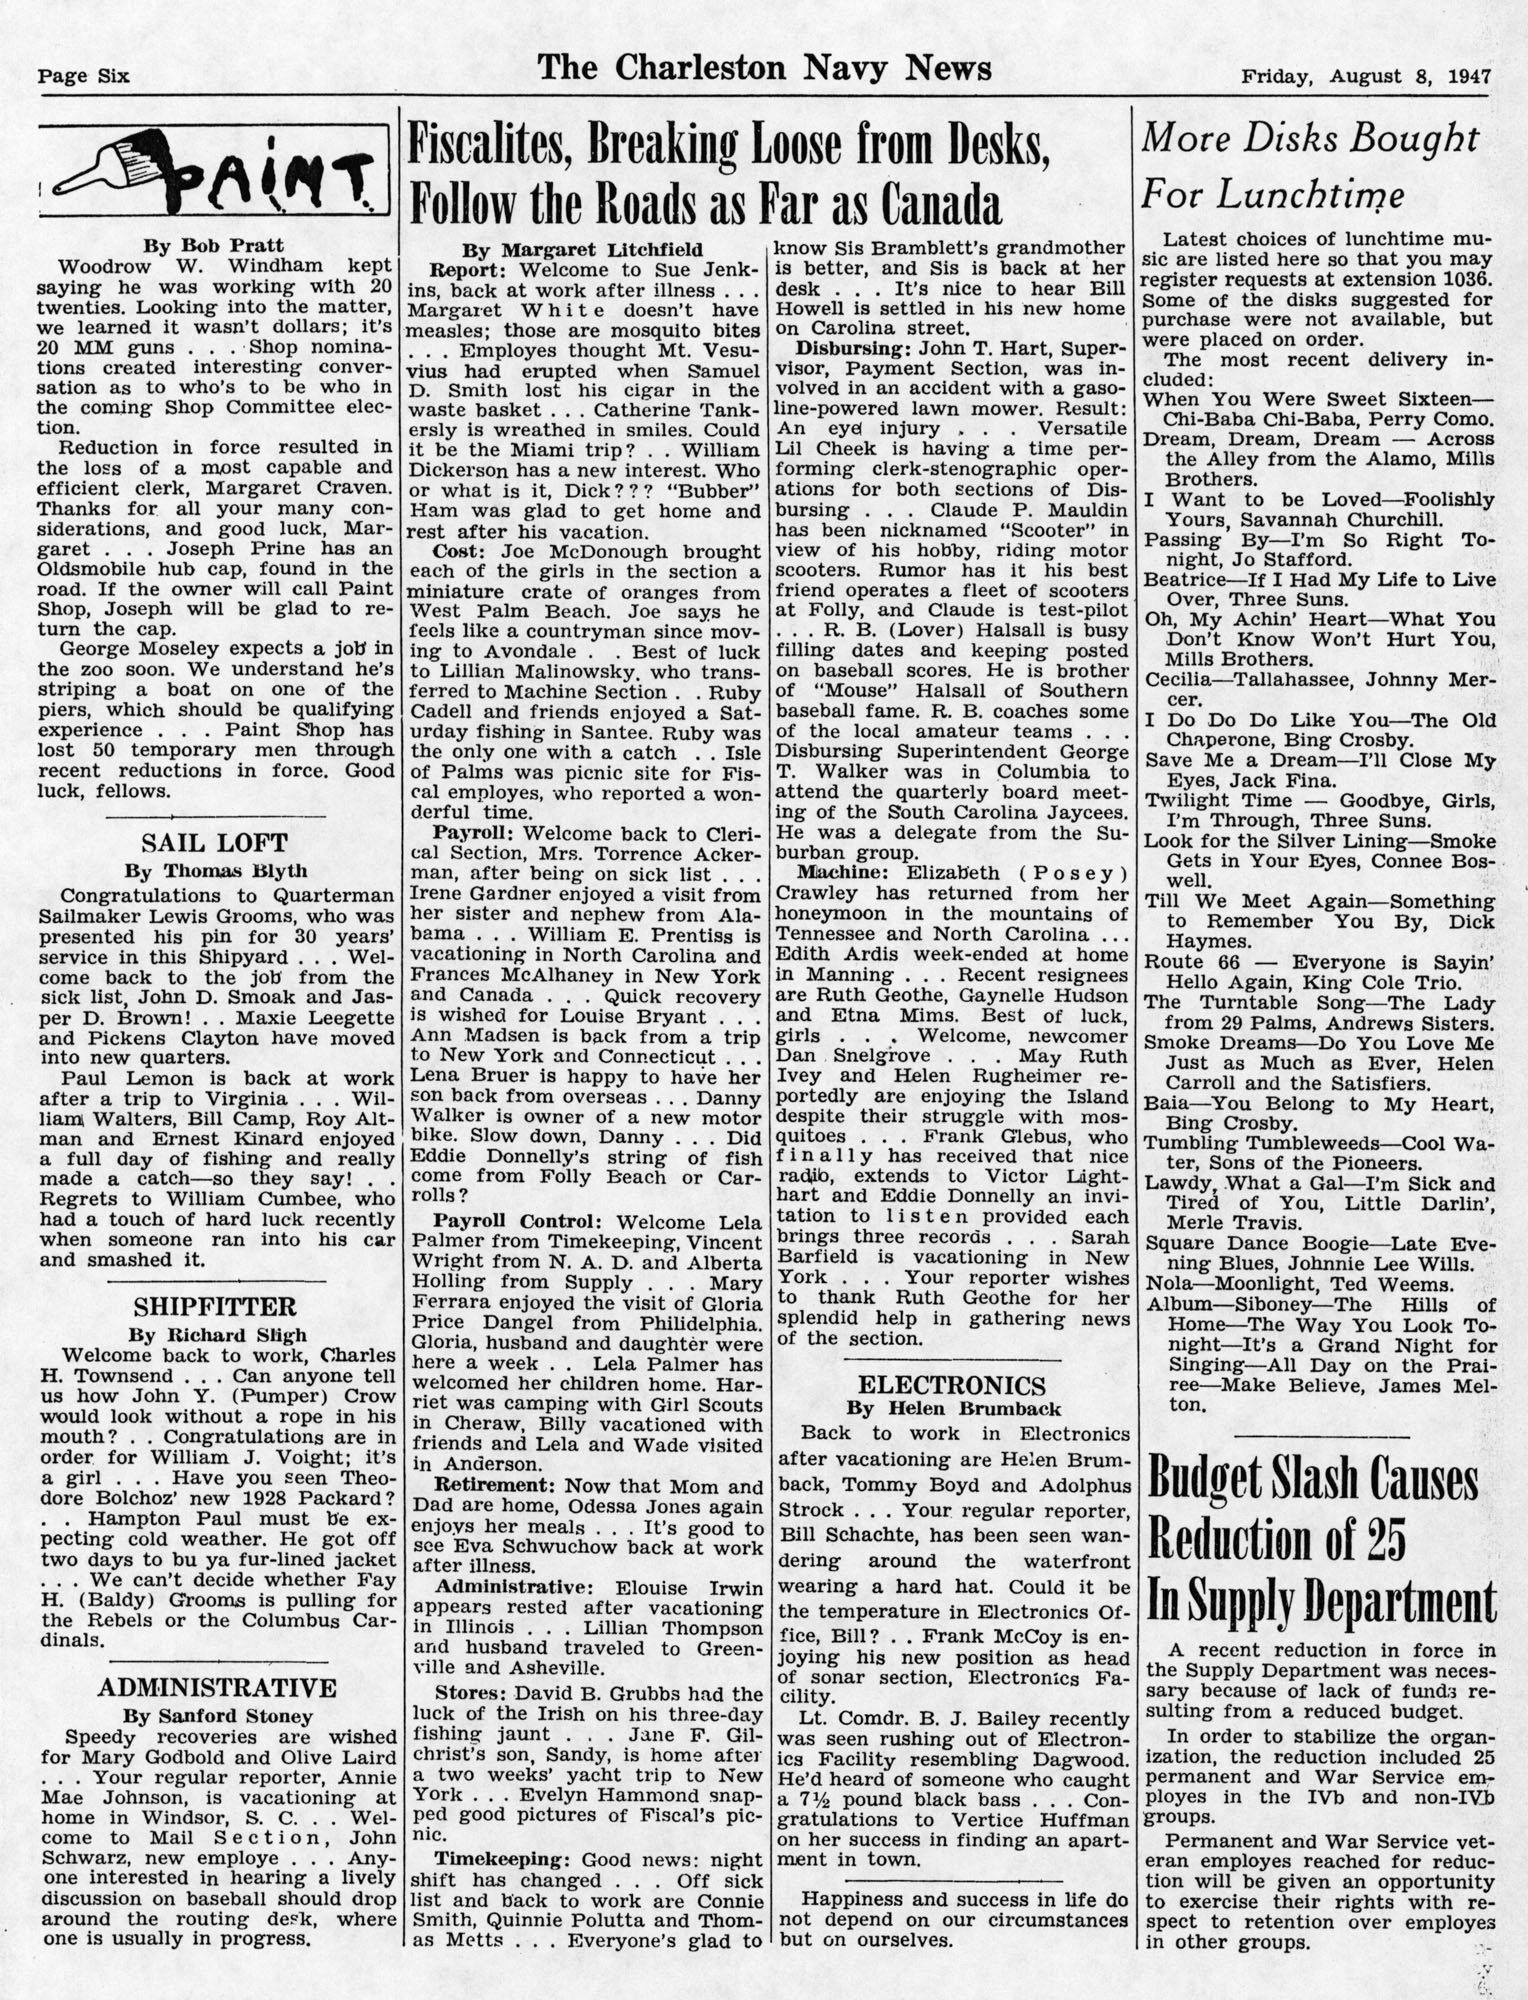 The Charleston Navy News, Volume 6, Edition 1, page vi